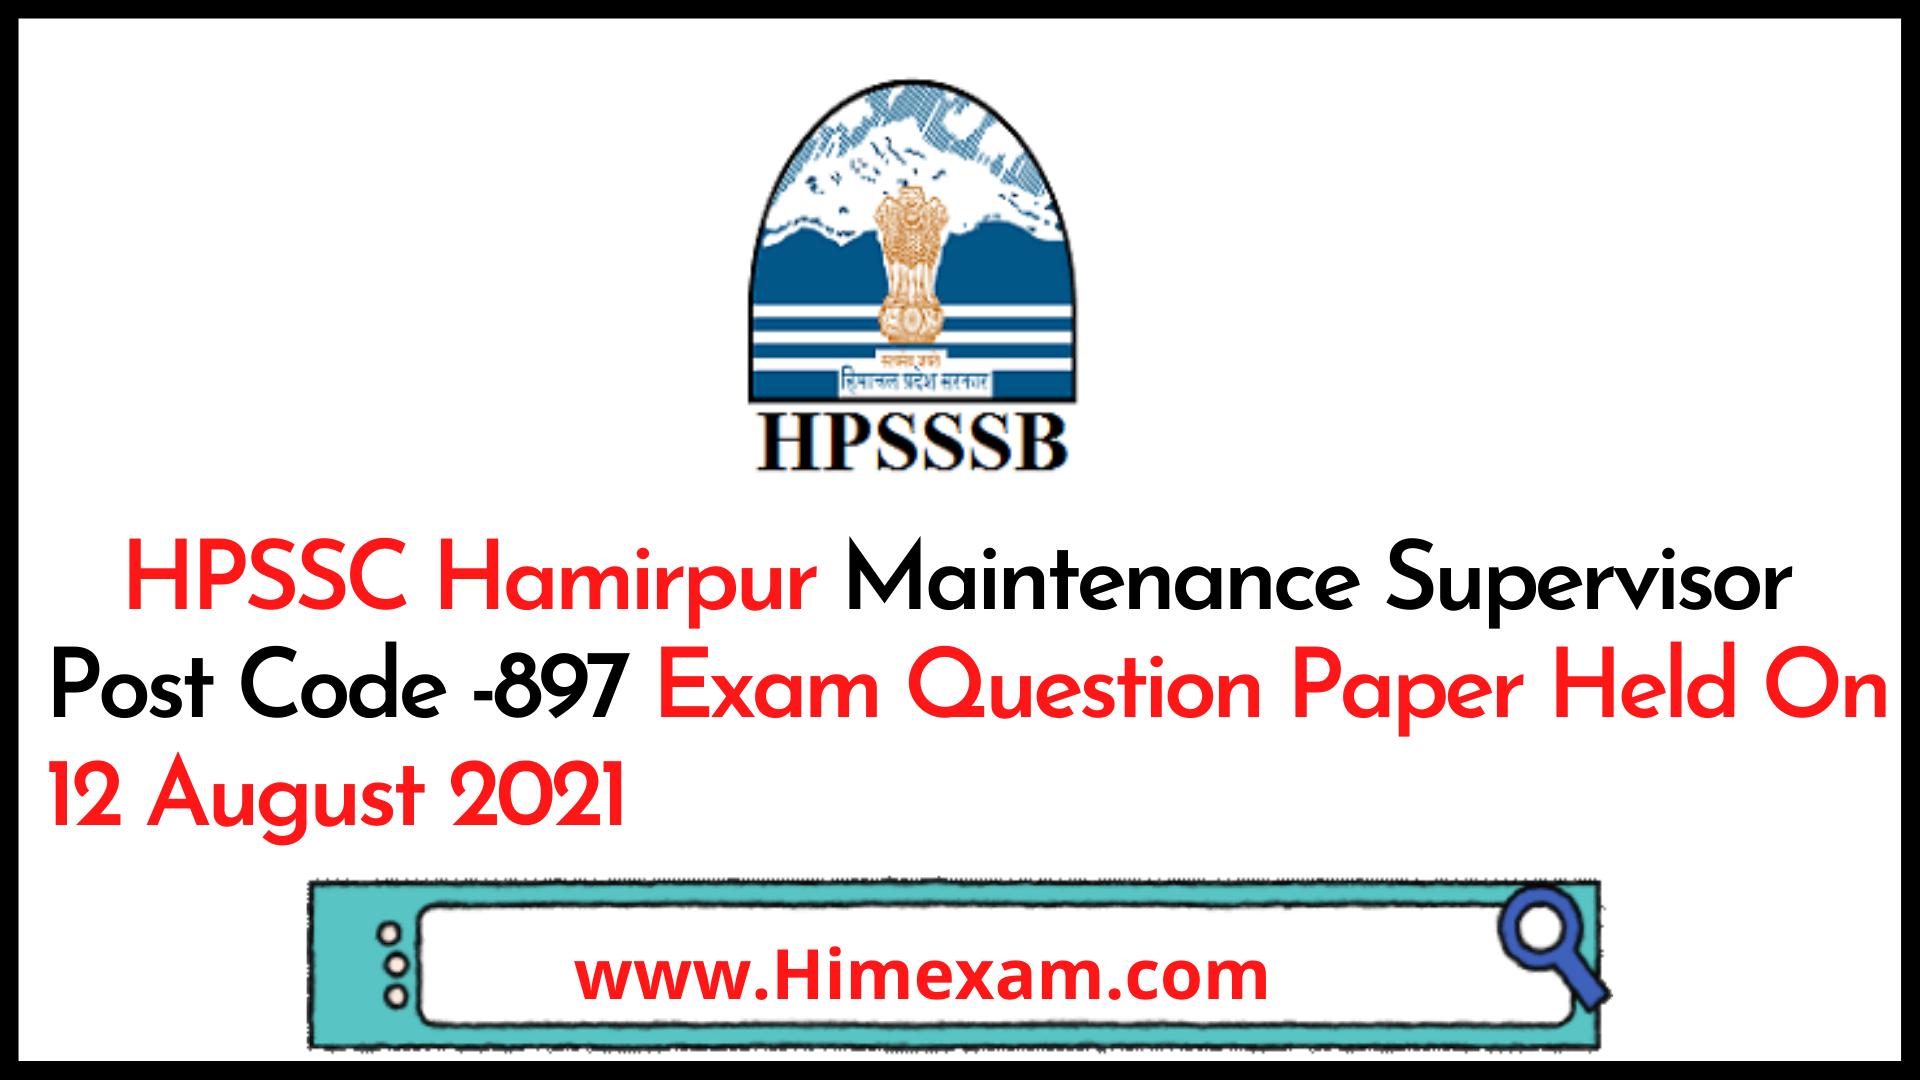 HPSSC Hamirpur Maintenance Supervisor  Post Code -897 Exam Question Paper Held On 12 August 2021